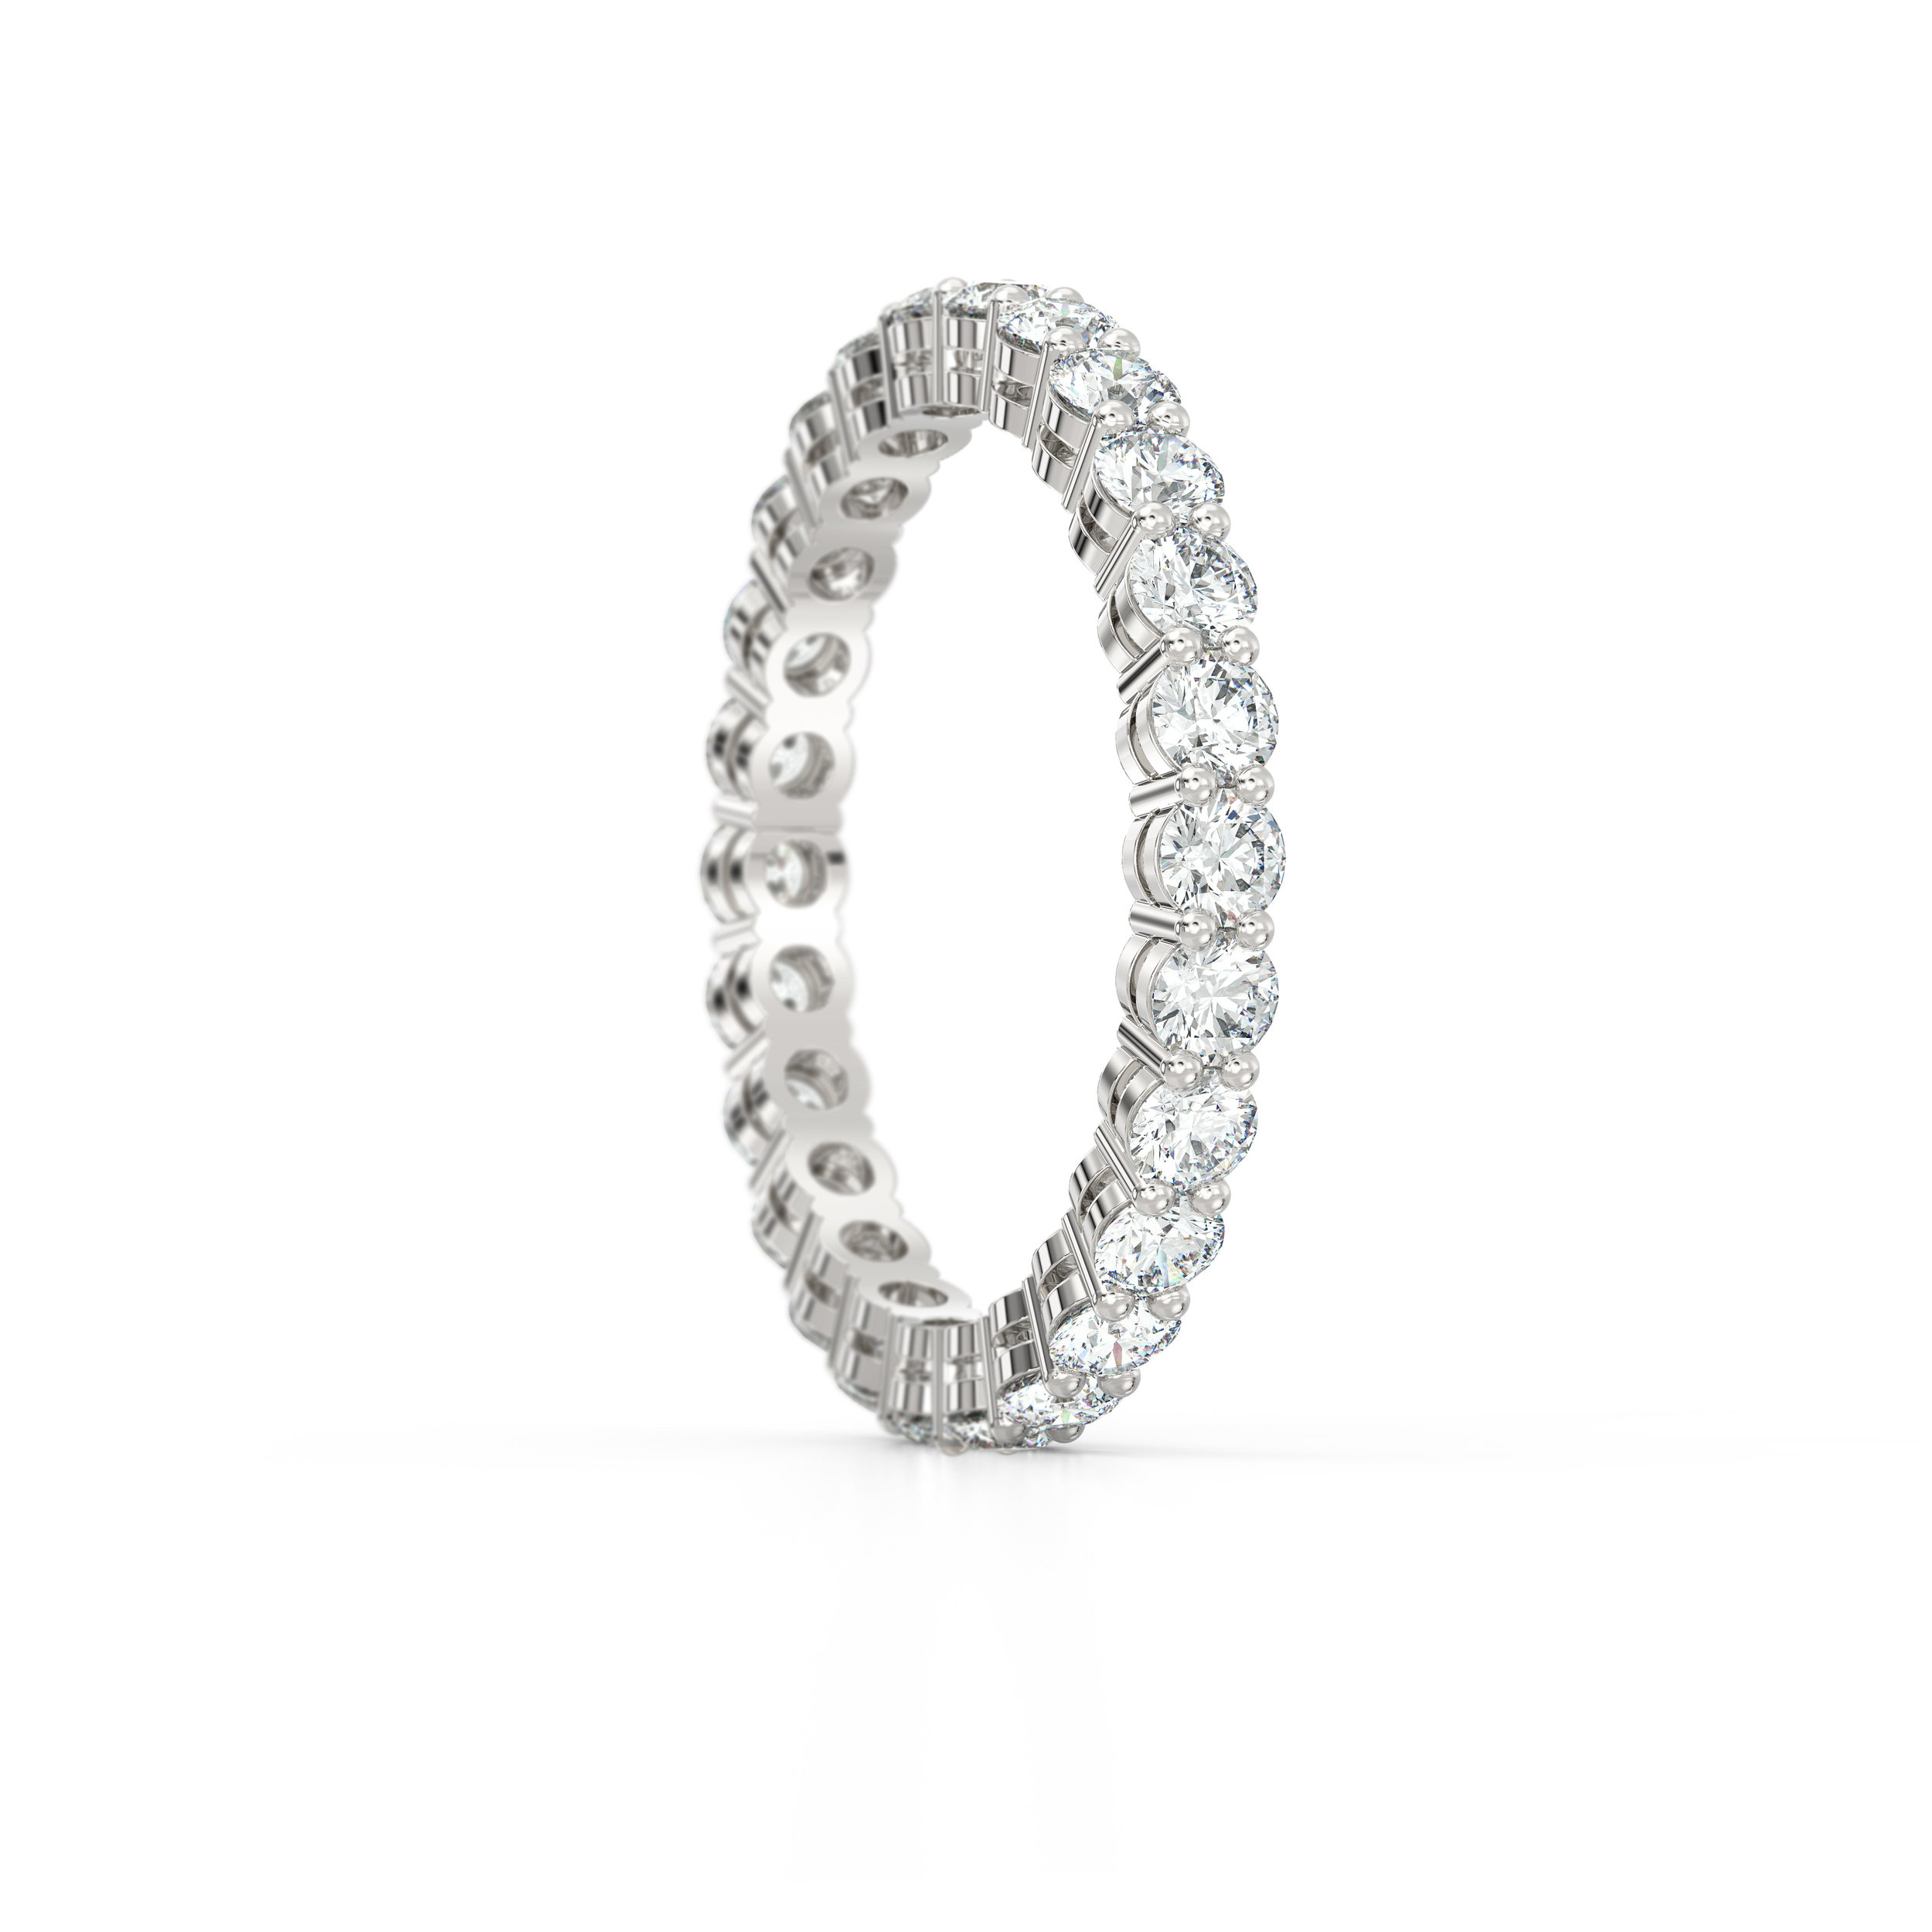 Shared Claw Eternity Ring | Hatton Garden Jewellers